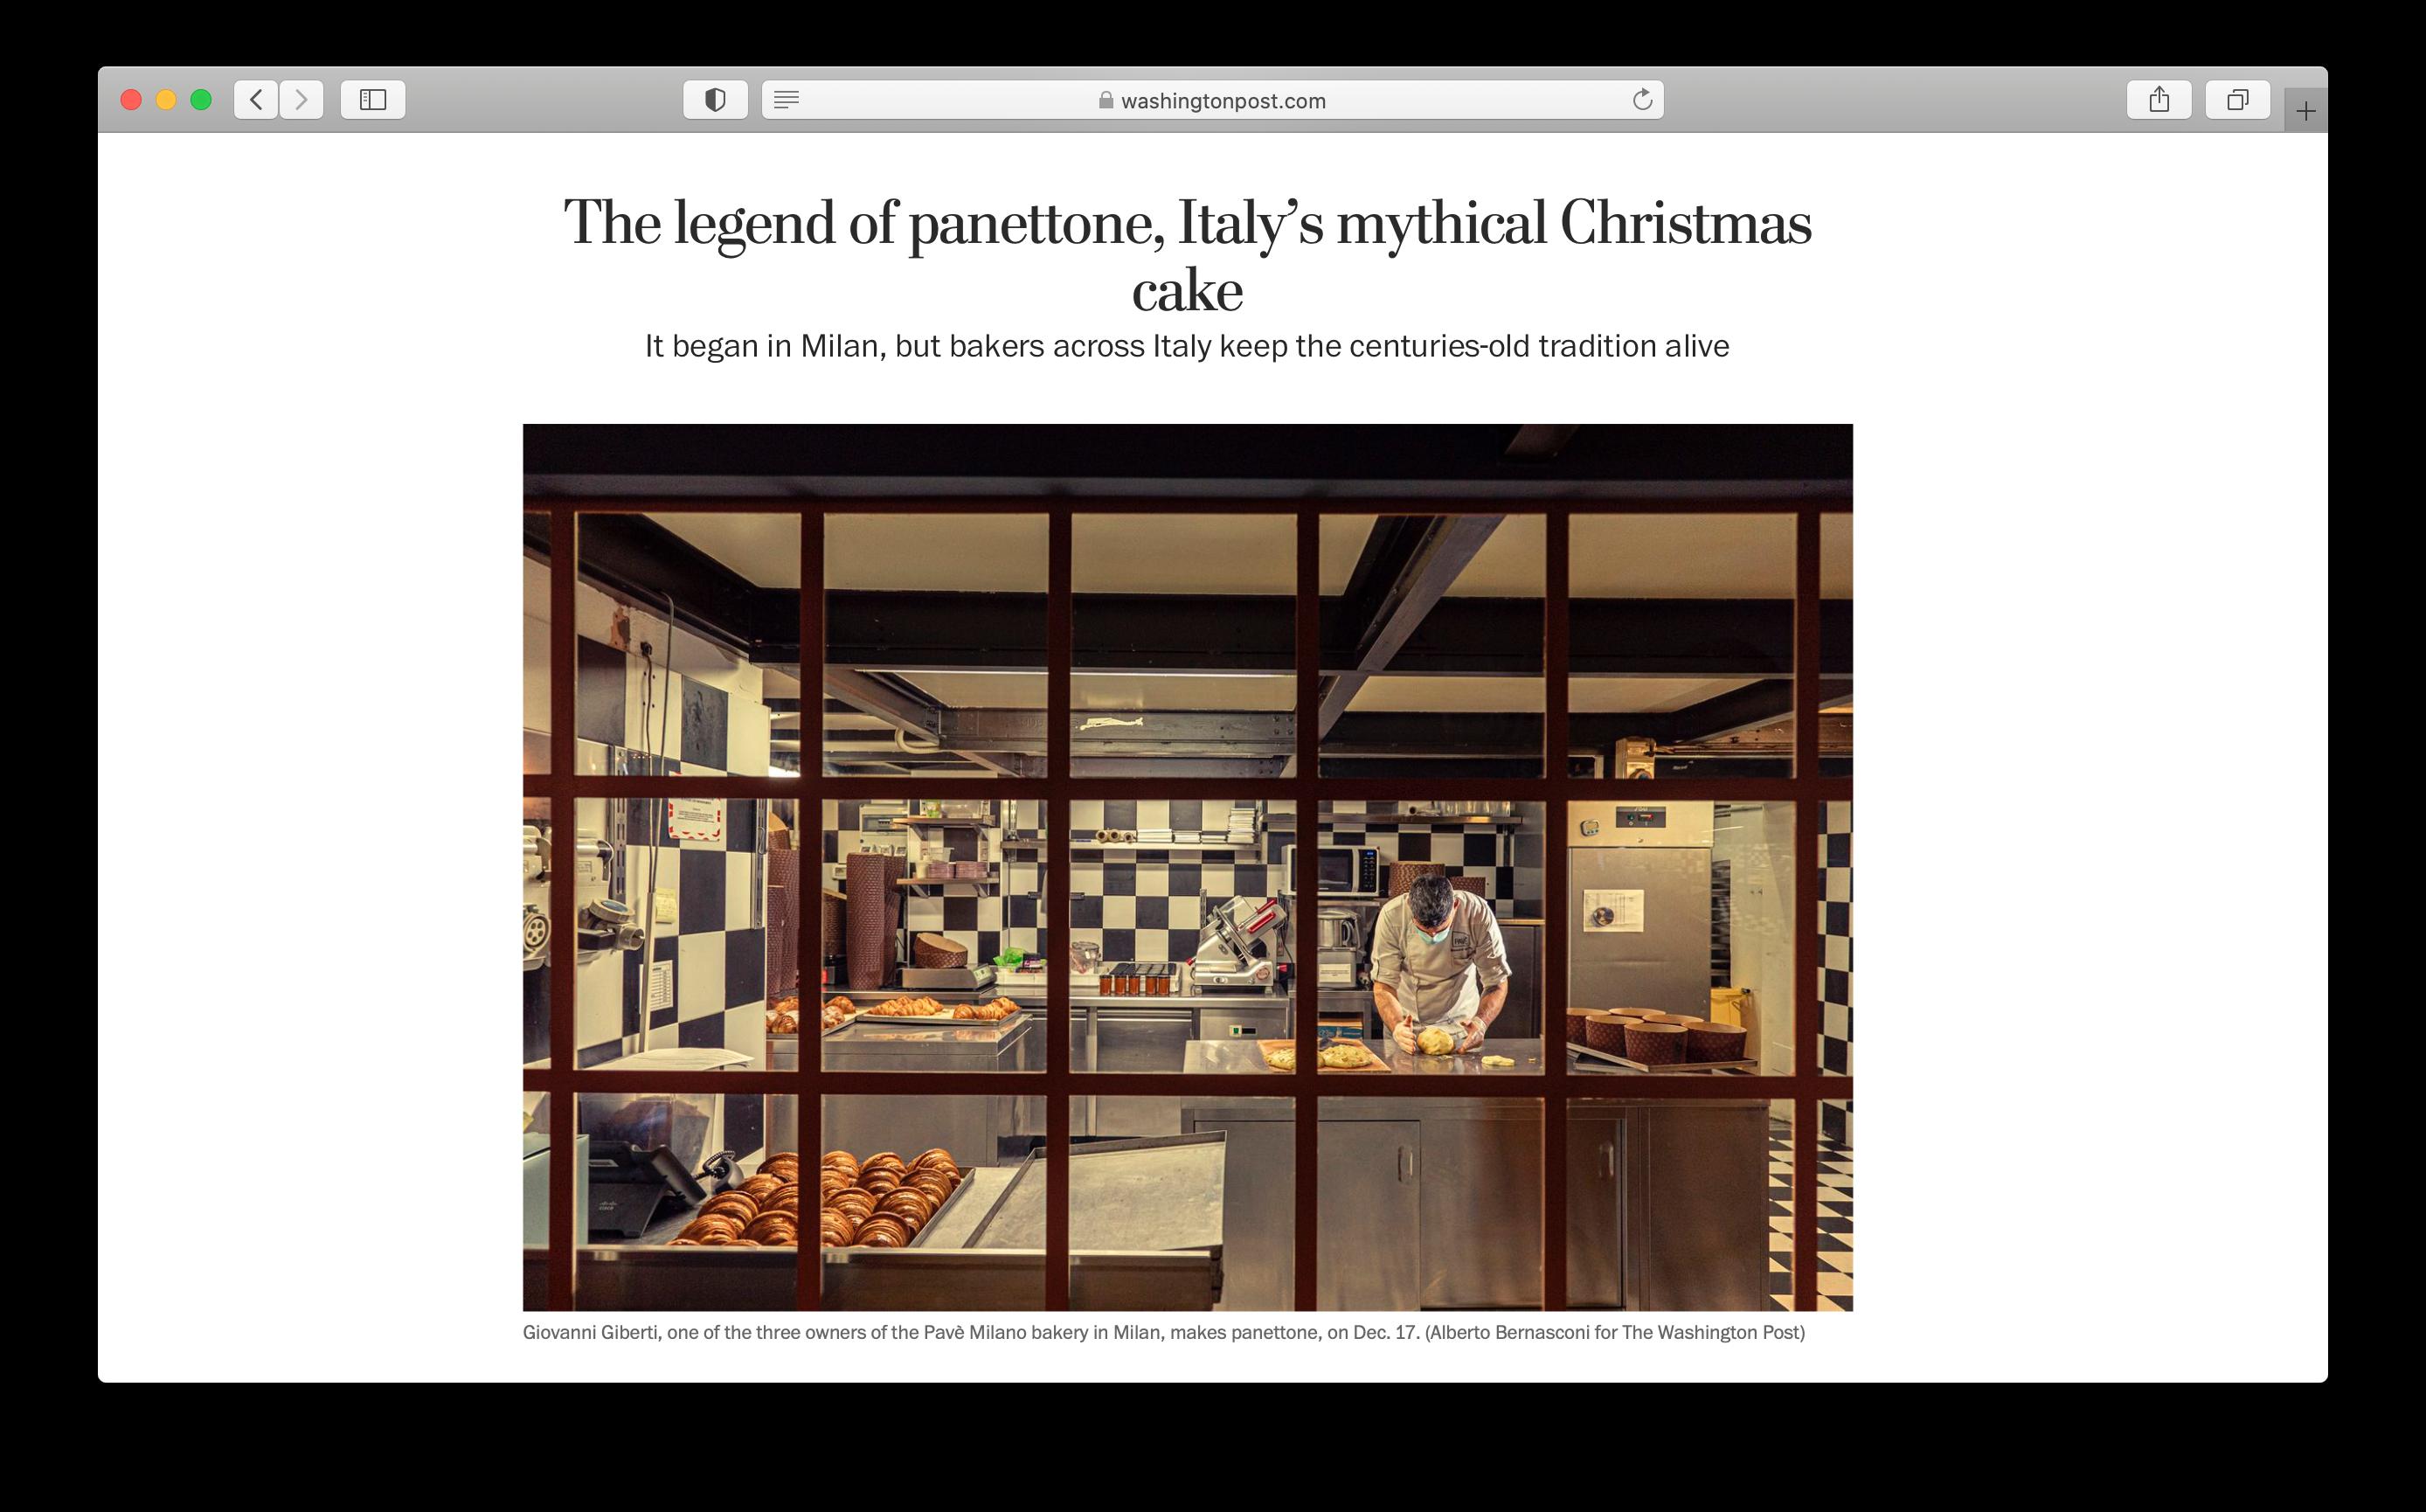 phoode, Washington Post food photography, phoode, editorial food photography, commercial food photography, food photographer, food industry, food business,